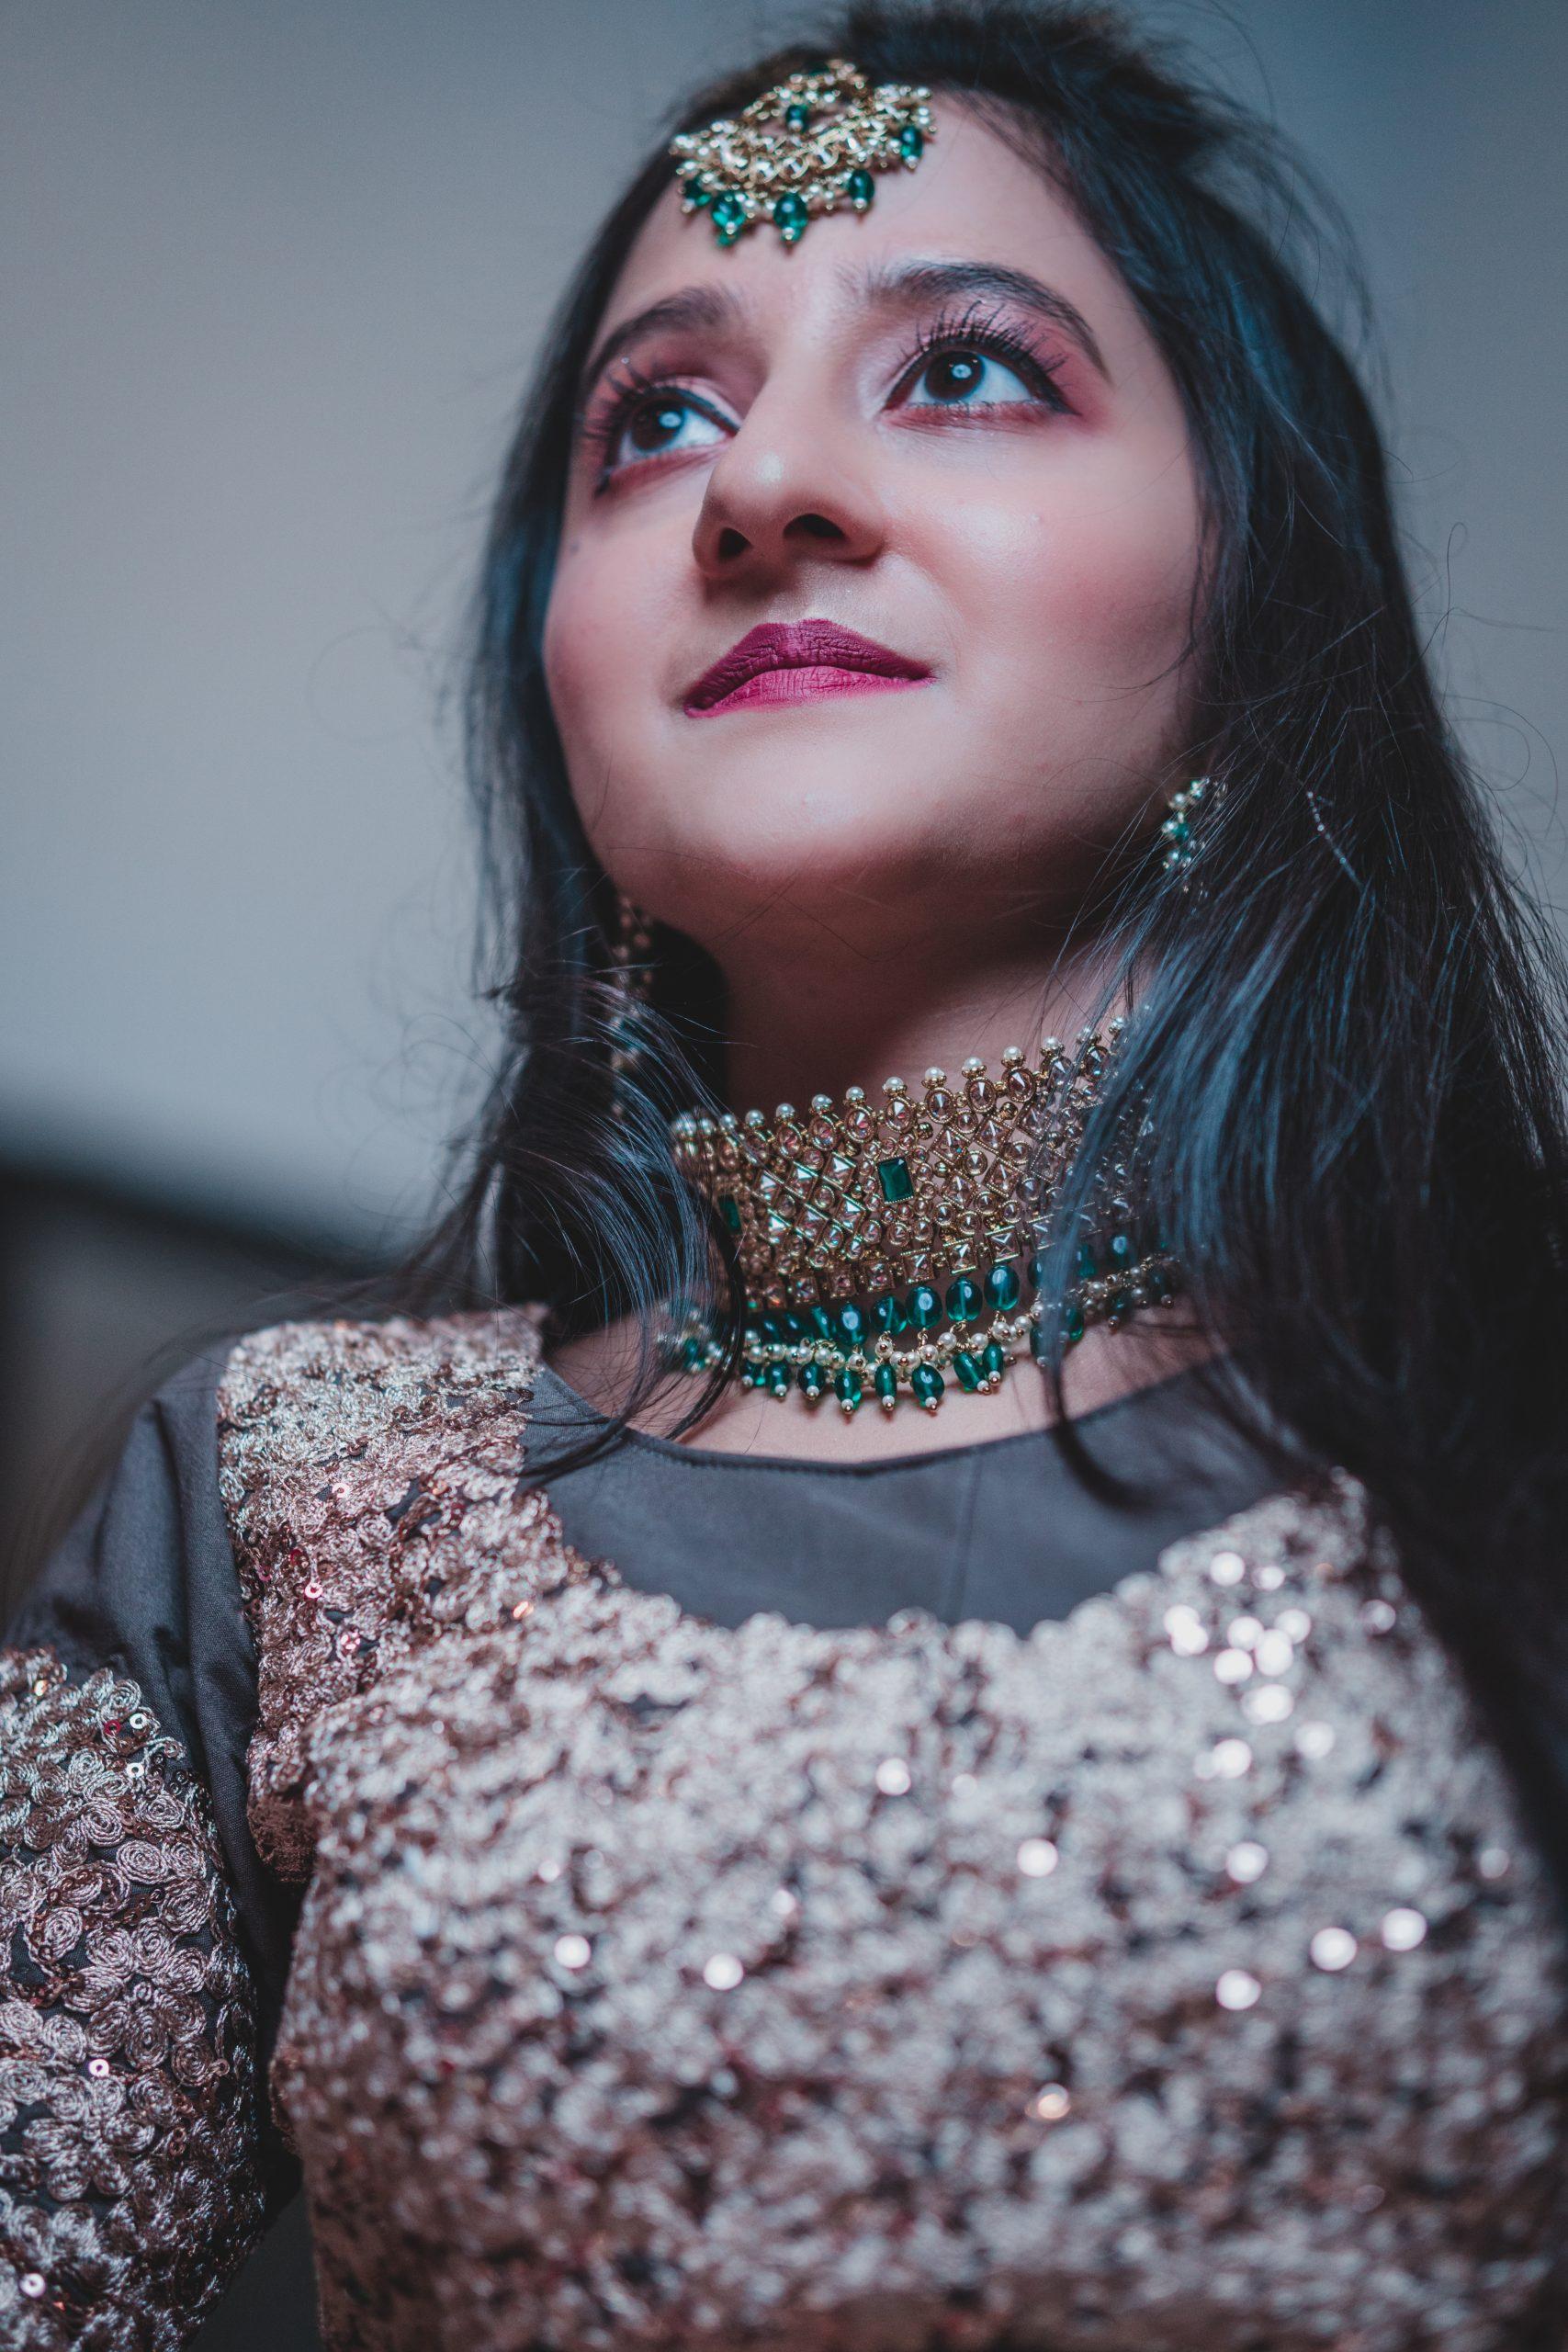 An Indian girl